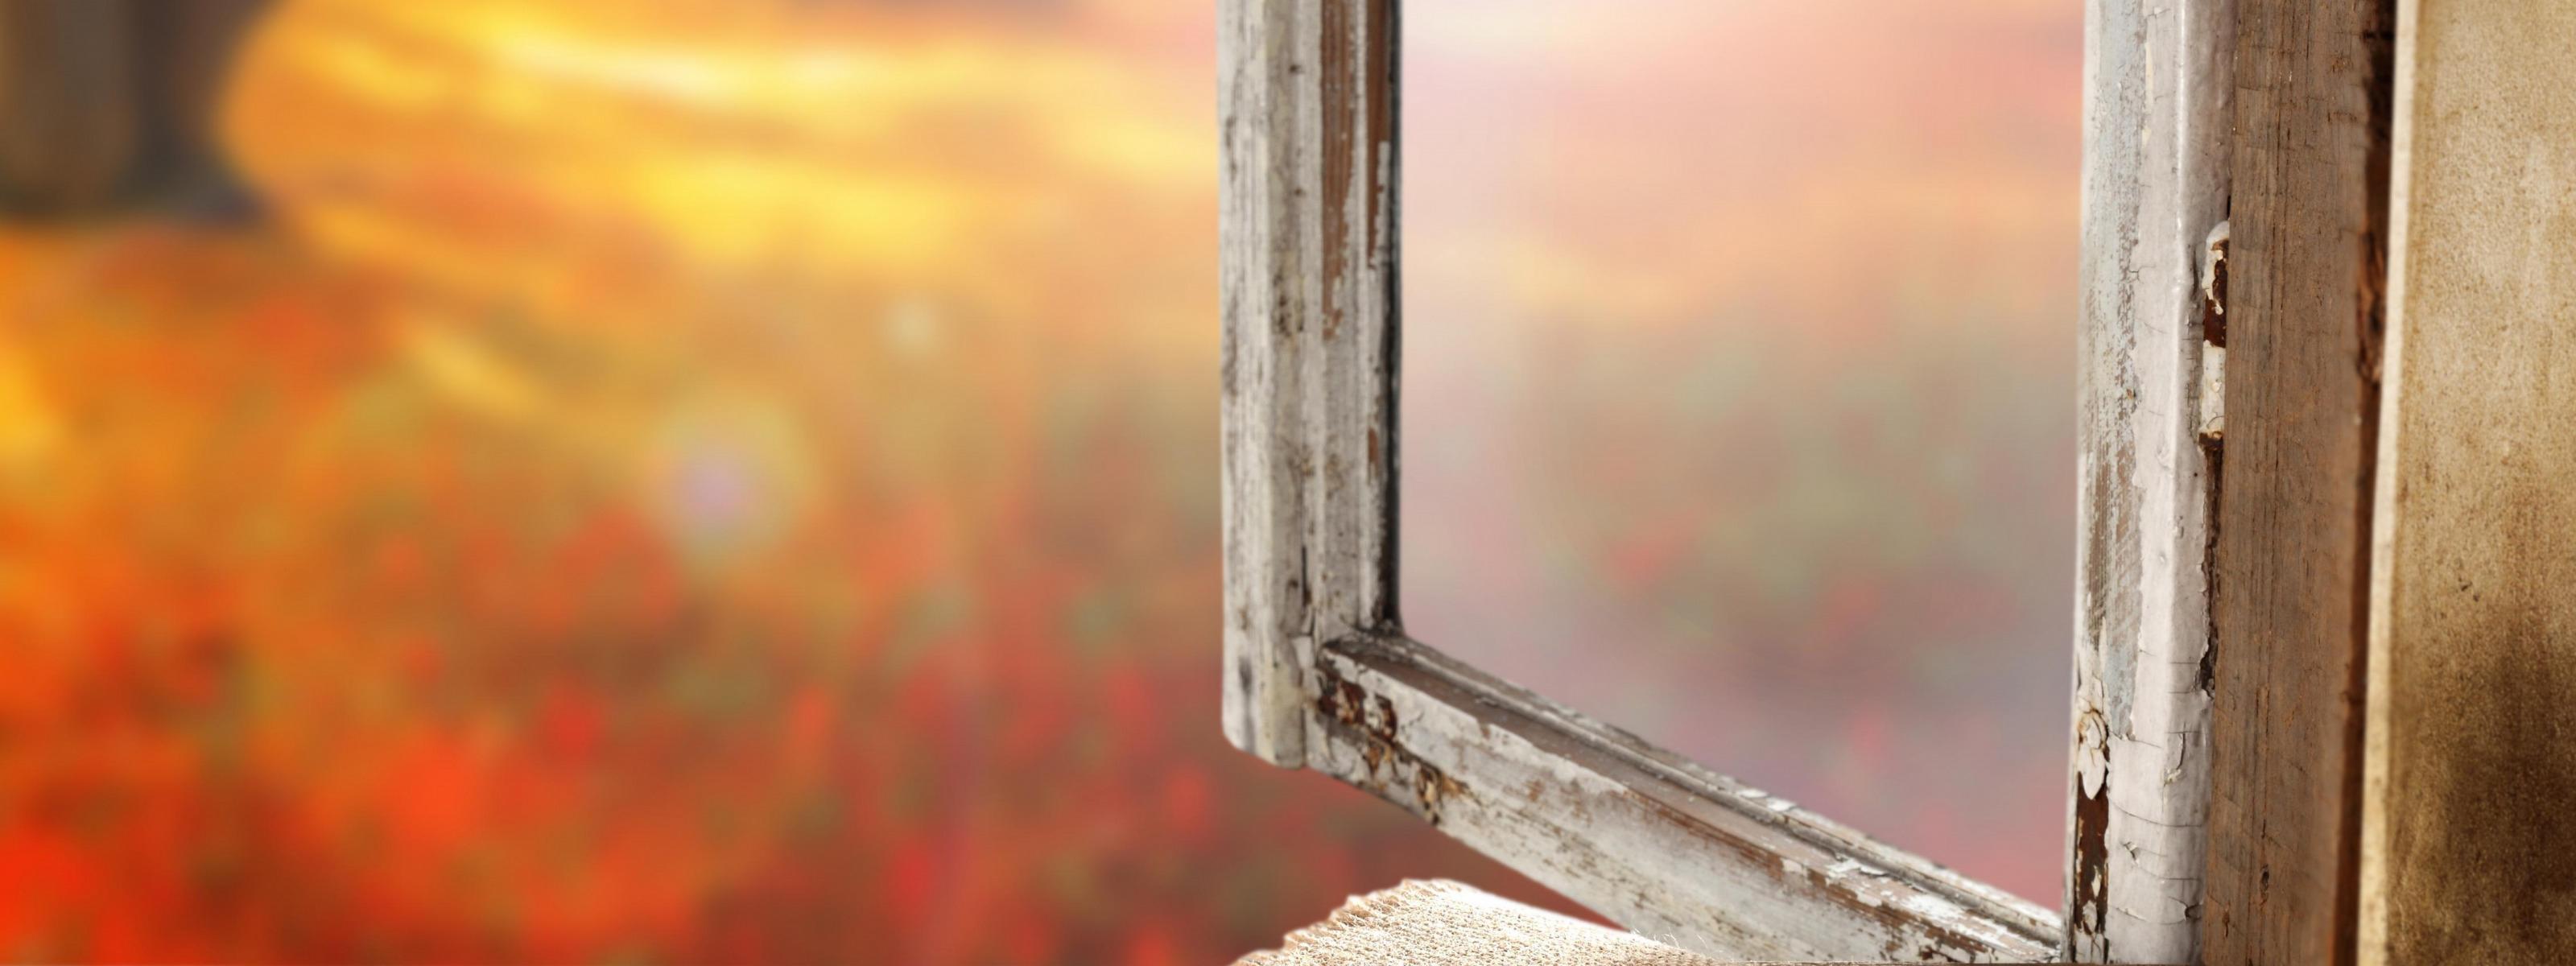 Обои подоконник, окно, осень, мешковина. Разное foto 12